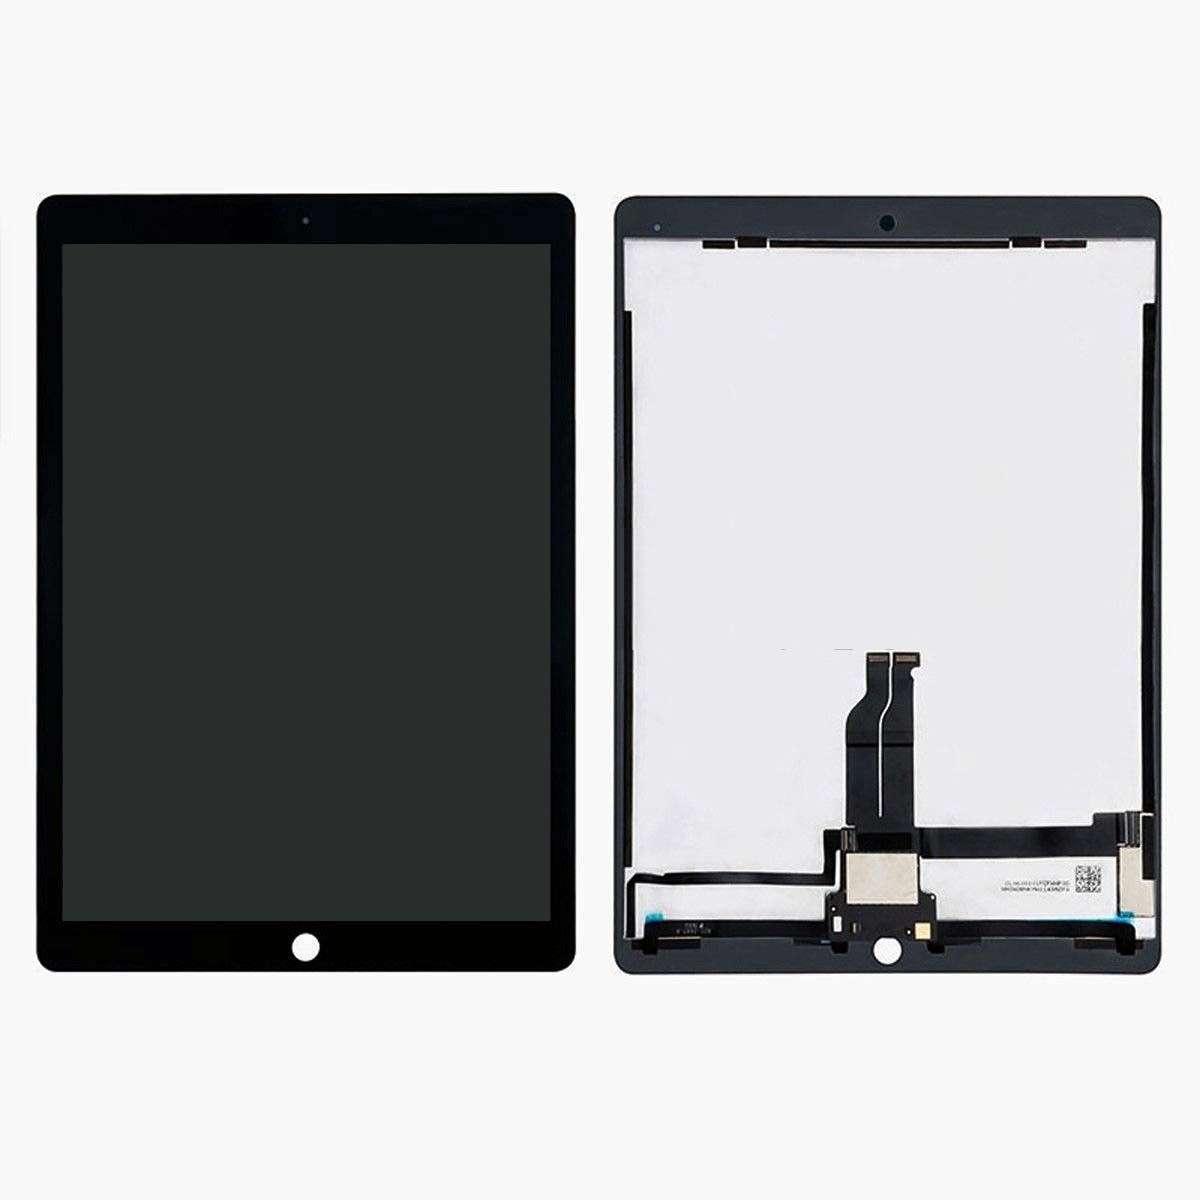 Ansamblu LCD Display Touchscreen Apple iPad Pro 12.9 2015 A1584 cu Electronica Negru imagine powerlaptop.ro 2021